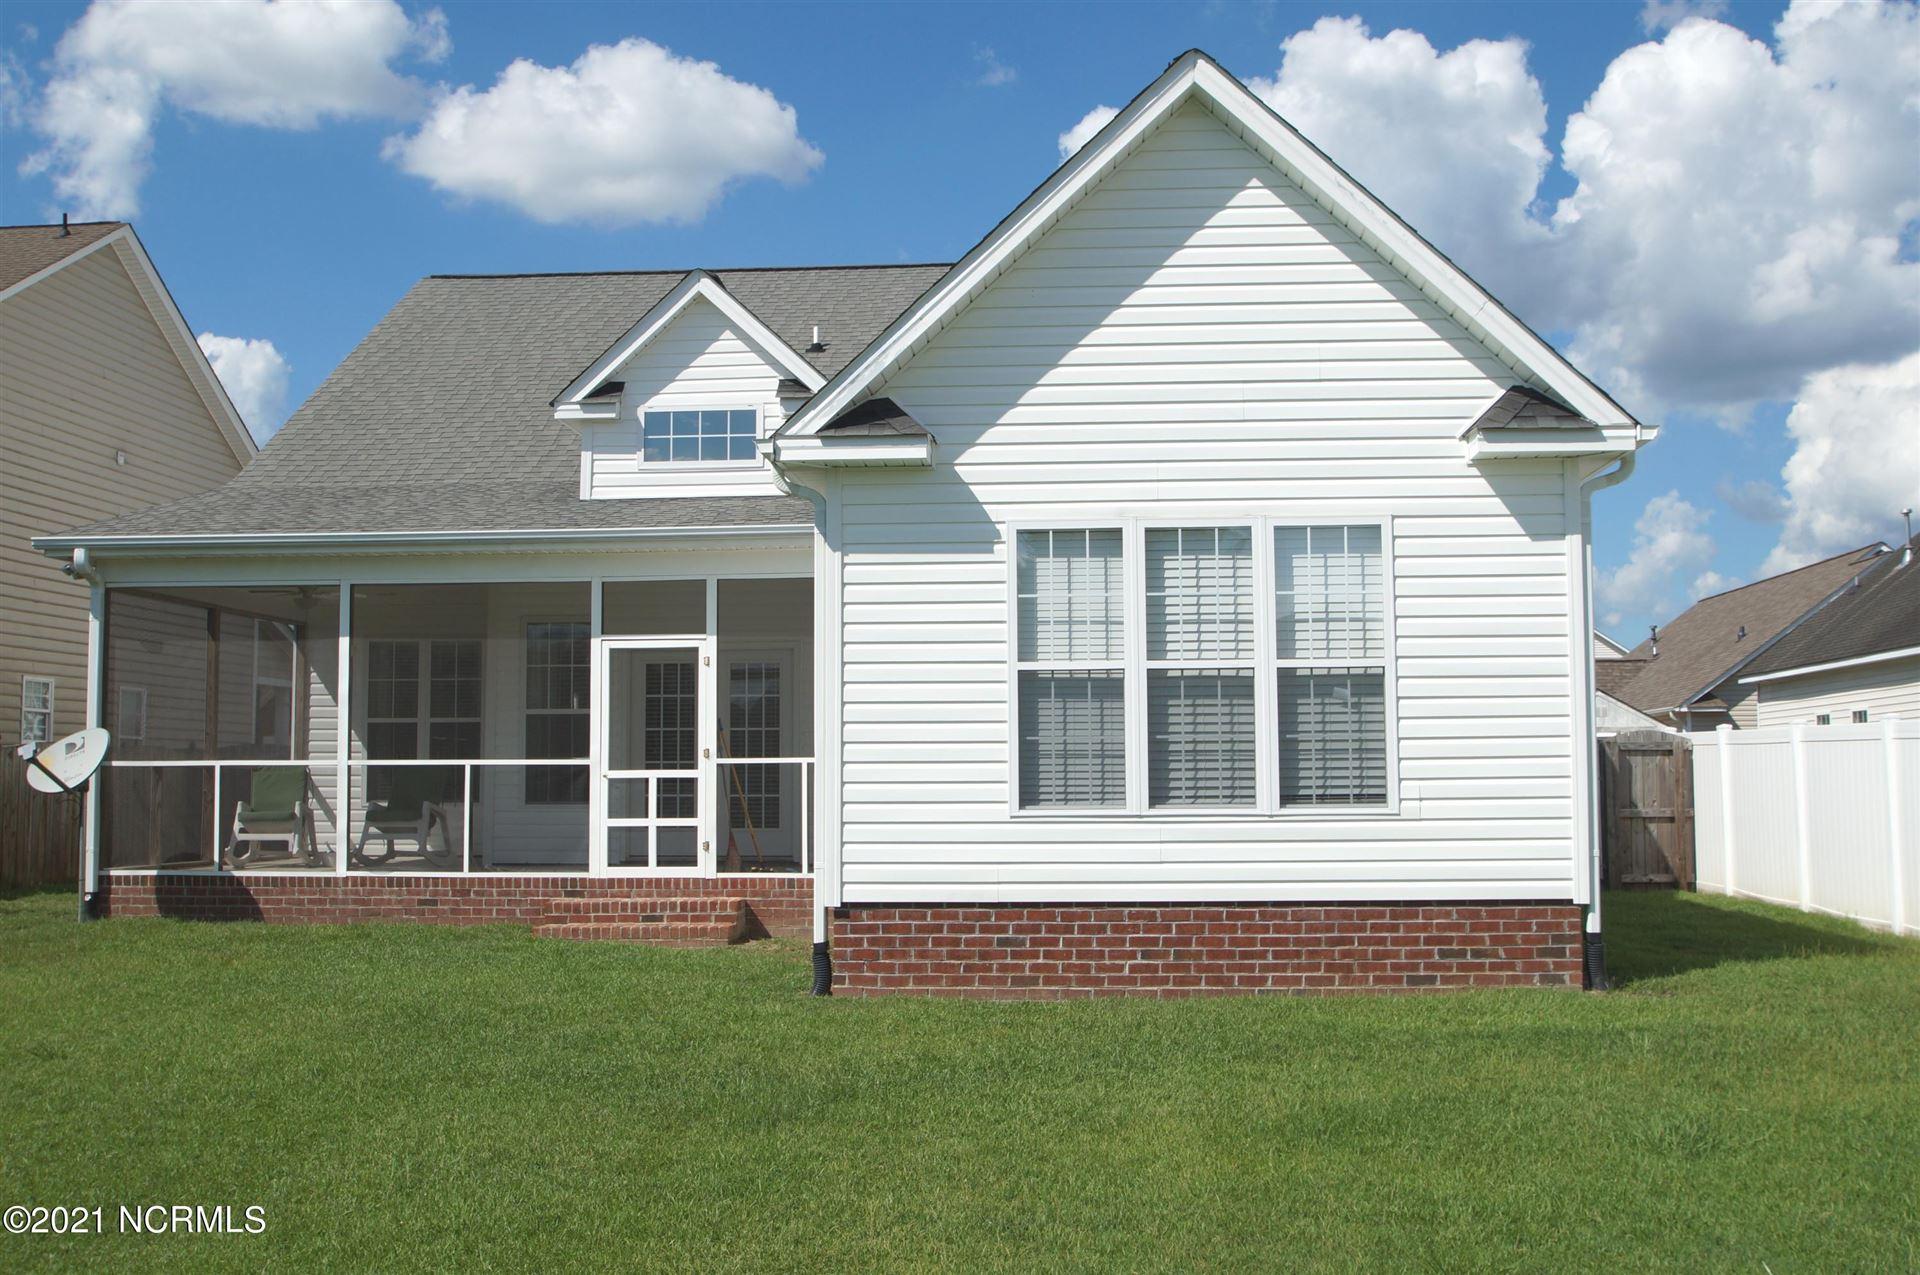 Photo of 2105 Ashgate Court, Winterville, NC 28590 (MLS # 100287182)